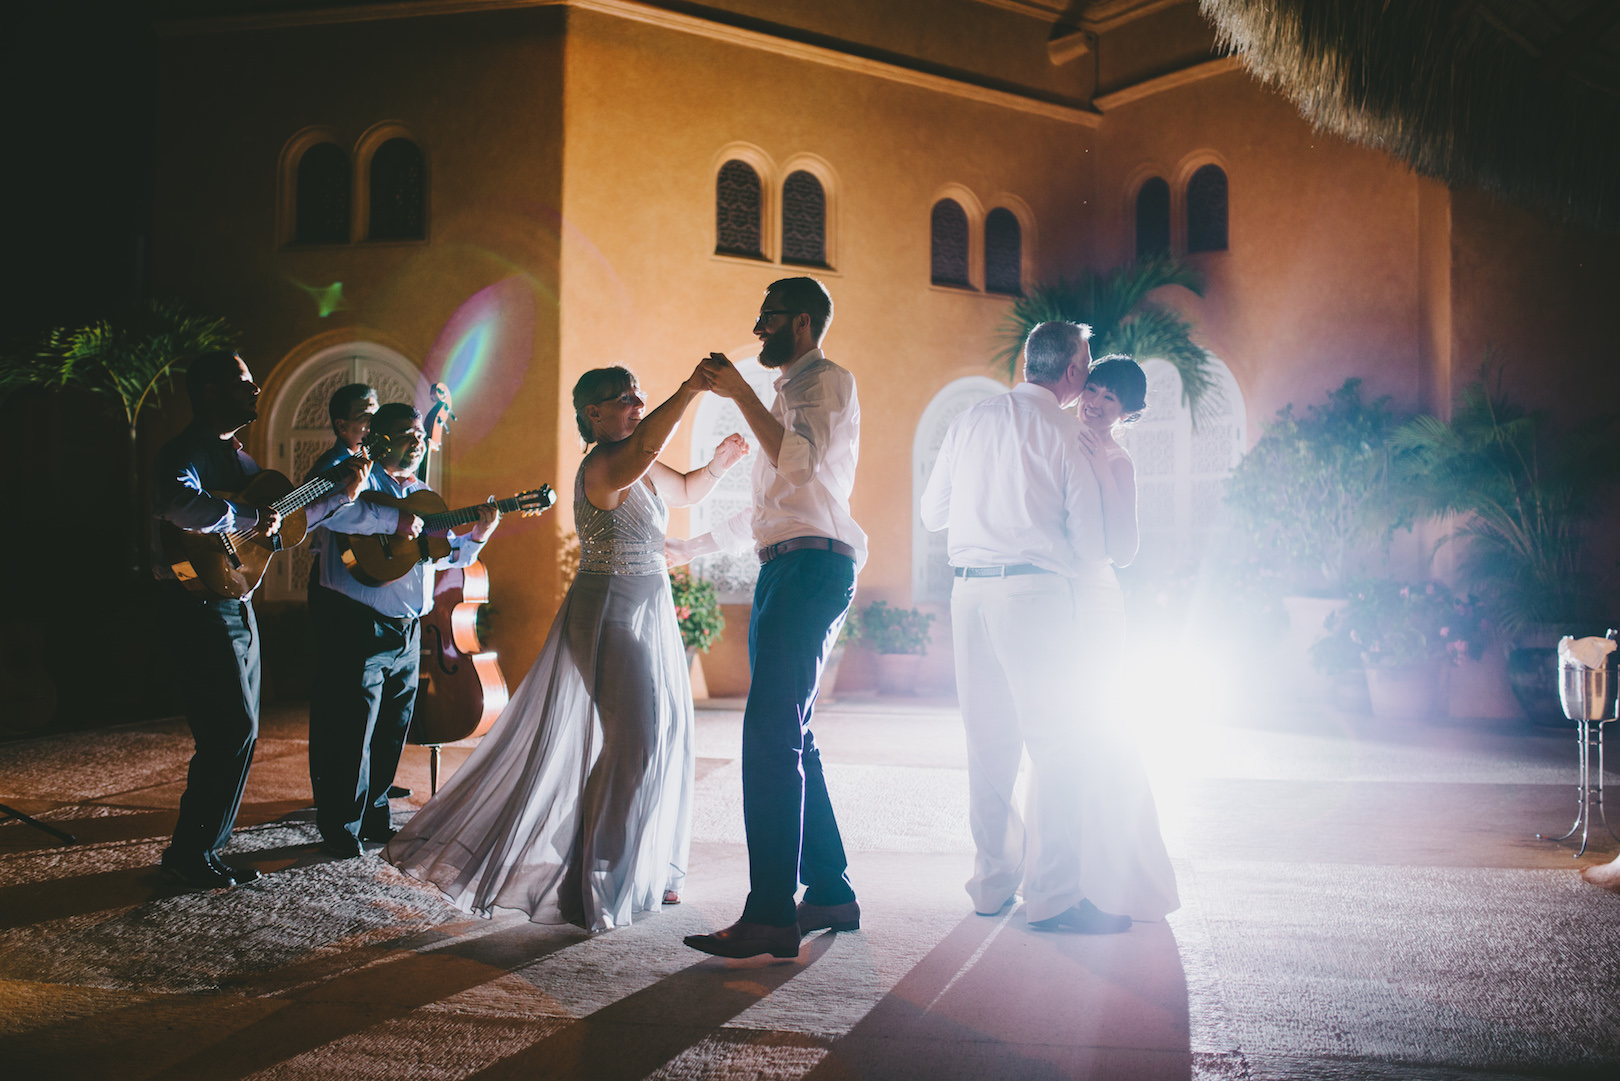 Nathan & Felicia - Wedding Day - © Dallas Kolotylo Photography - 651